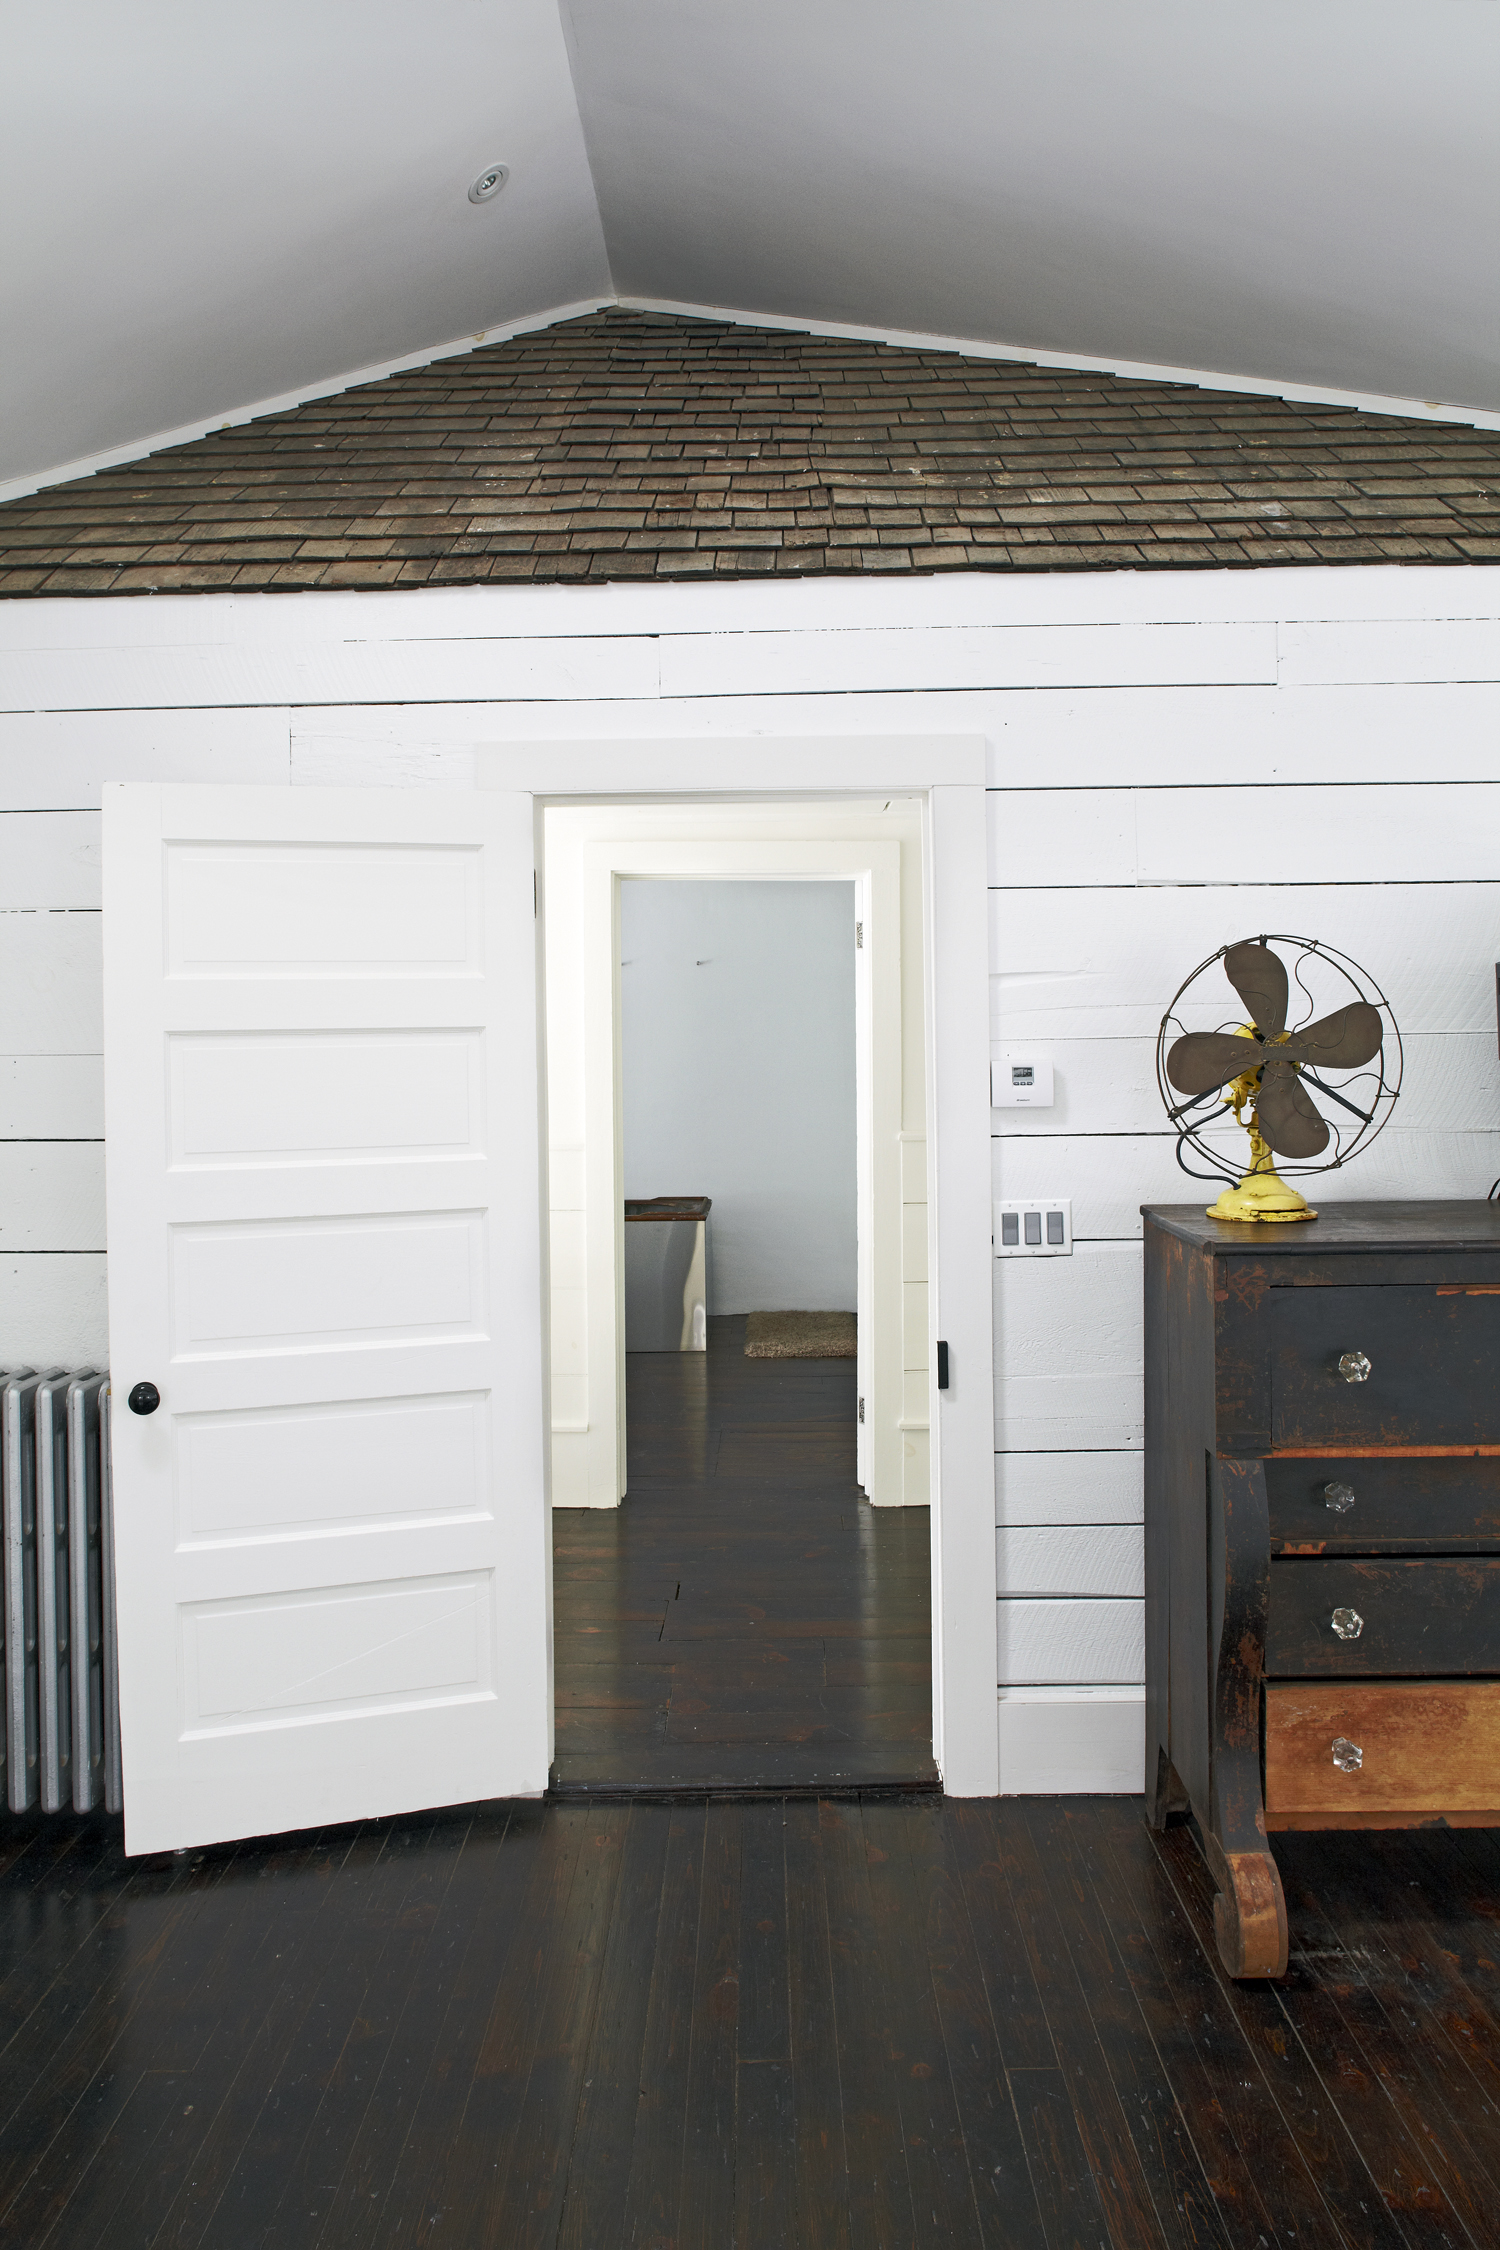 Master bedroom original cedar roof shingles in the Floating Farmhouse Catskills vacation rental in upstate New York.